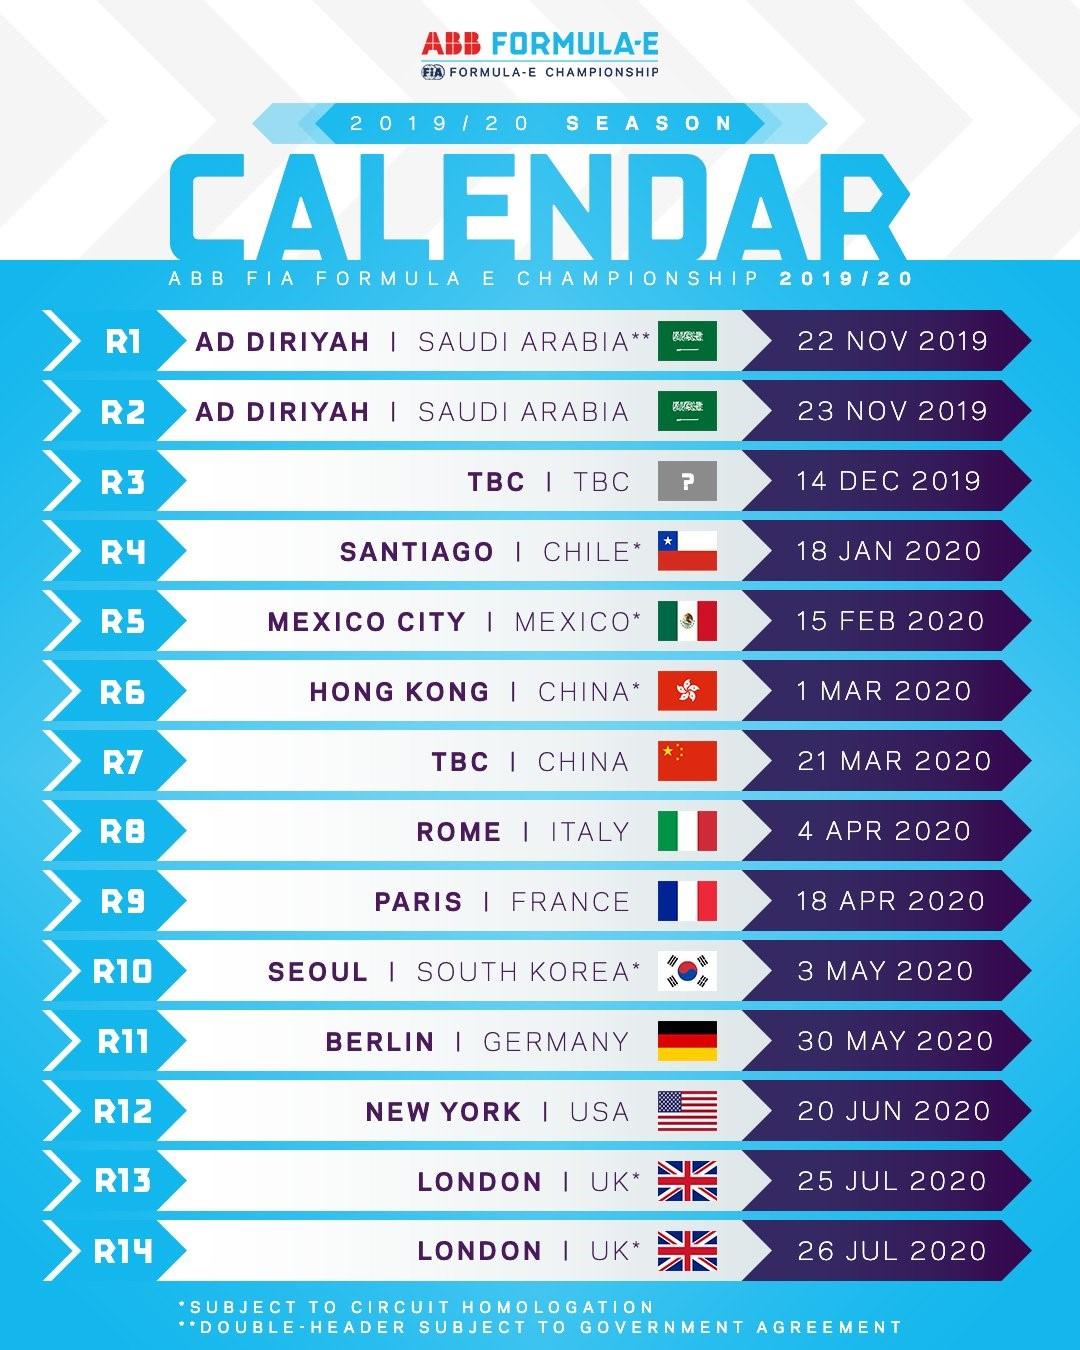 Calendrier Formule E 2020.Formule E La Mercedes A Tourne A Varano Formule E